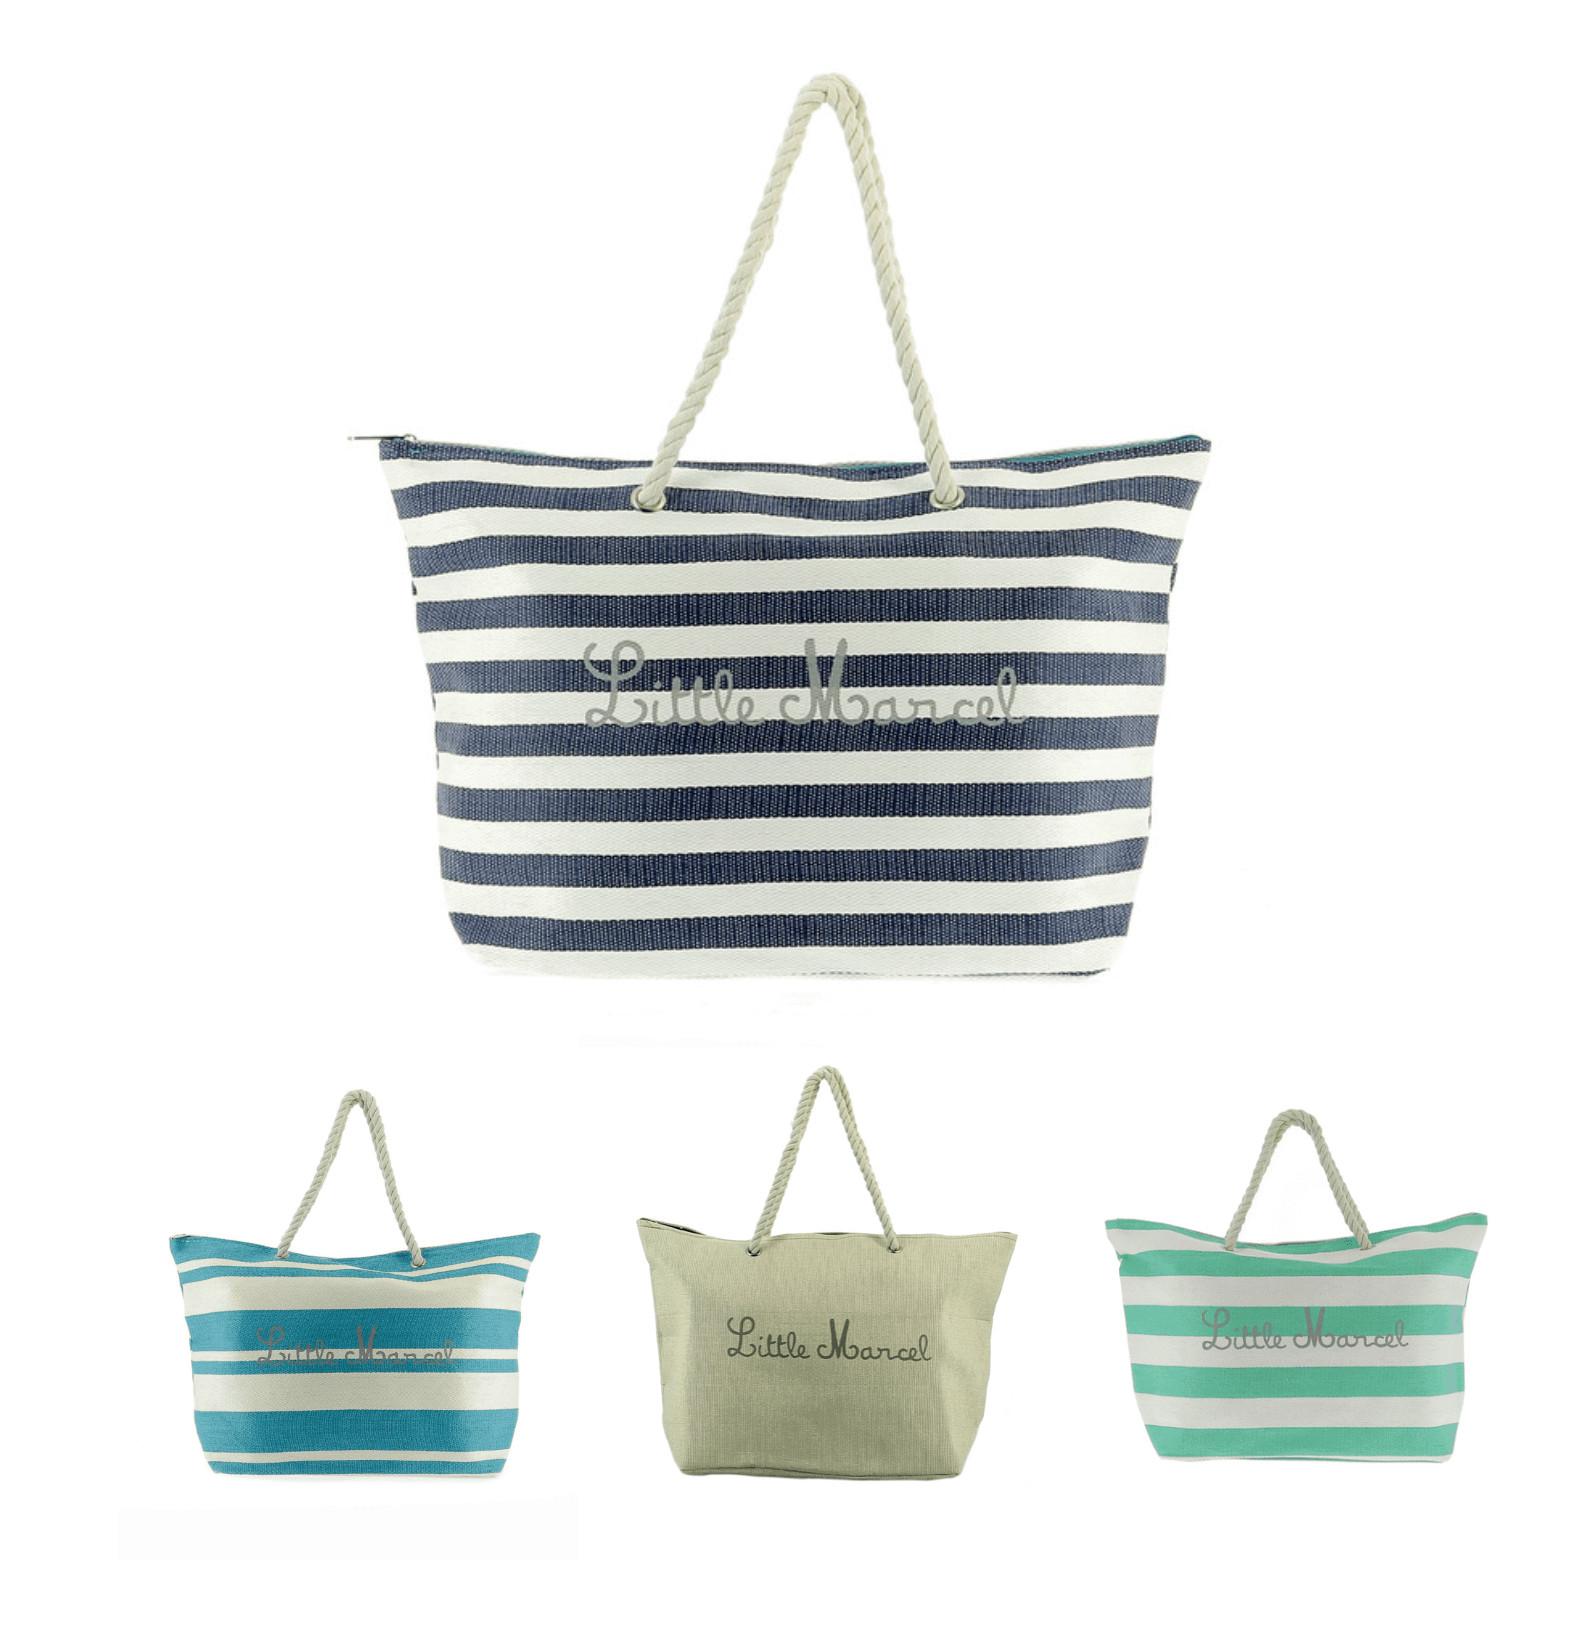 Little Marcel Beach Bags for Summer OuiPlease OuiBlog